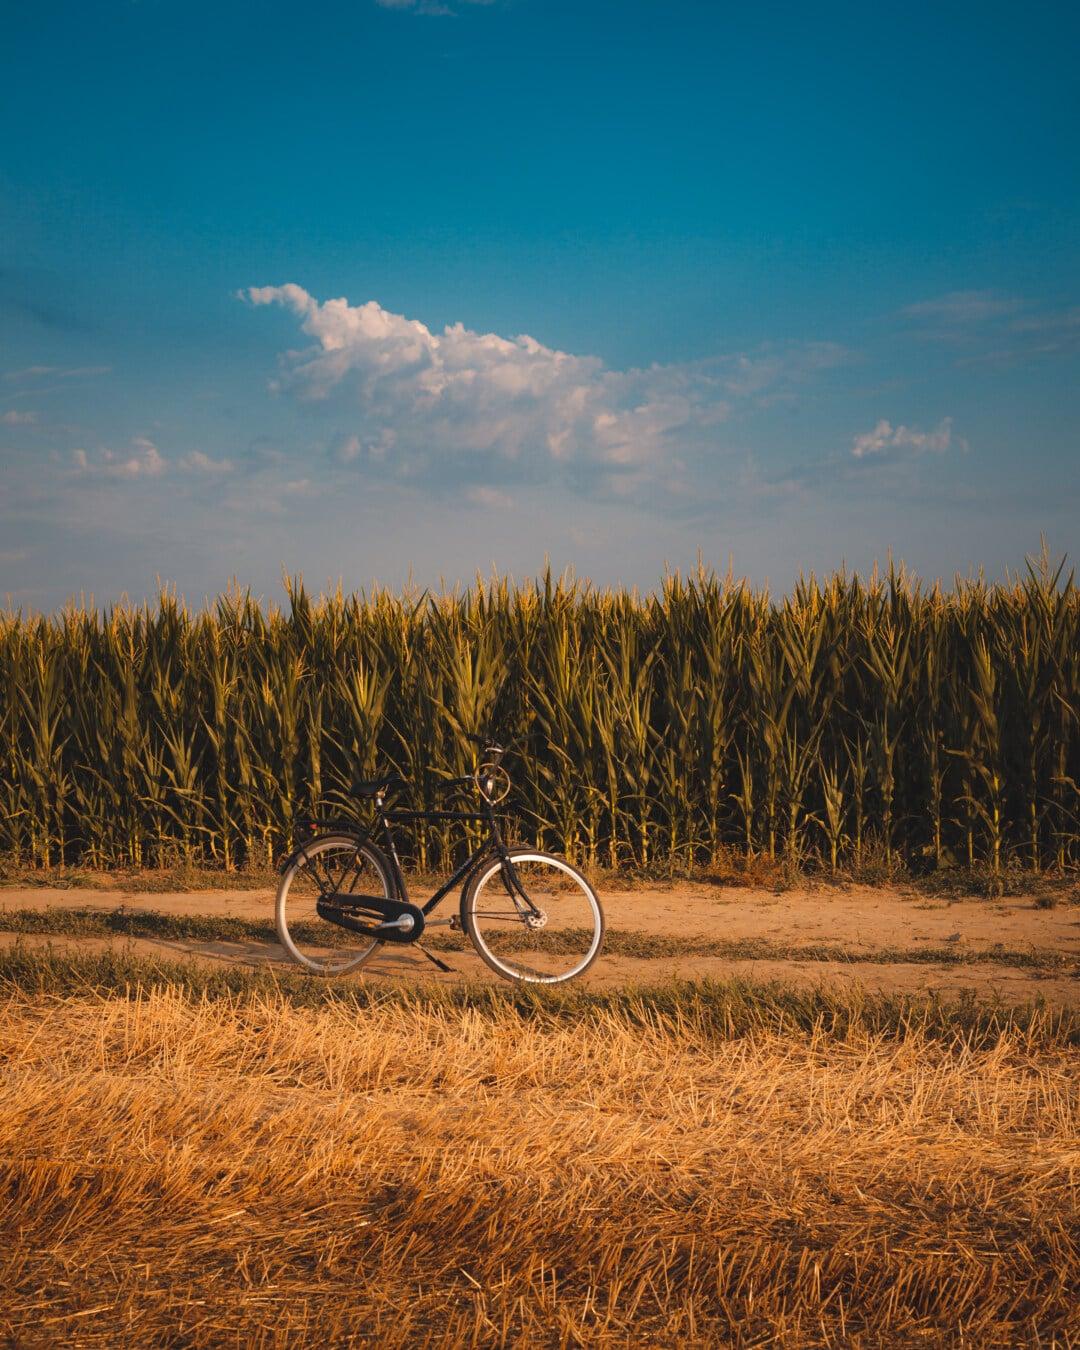 corn, cornfield, summer, bicycle, field, rural, wheat, sugar, landscape, cereal